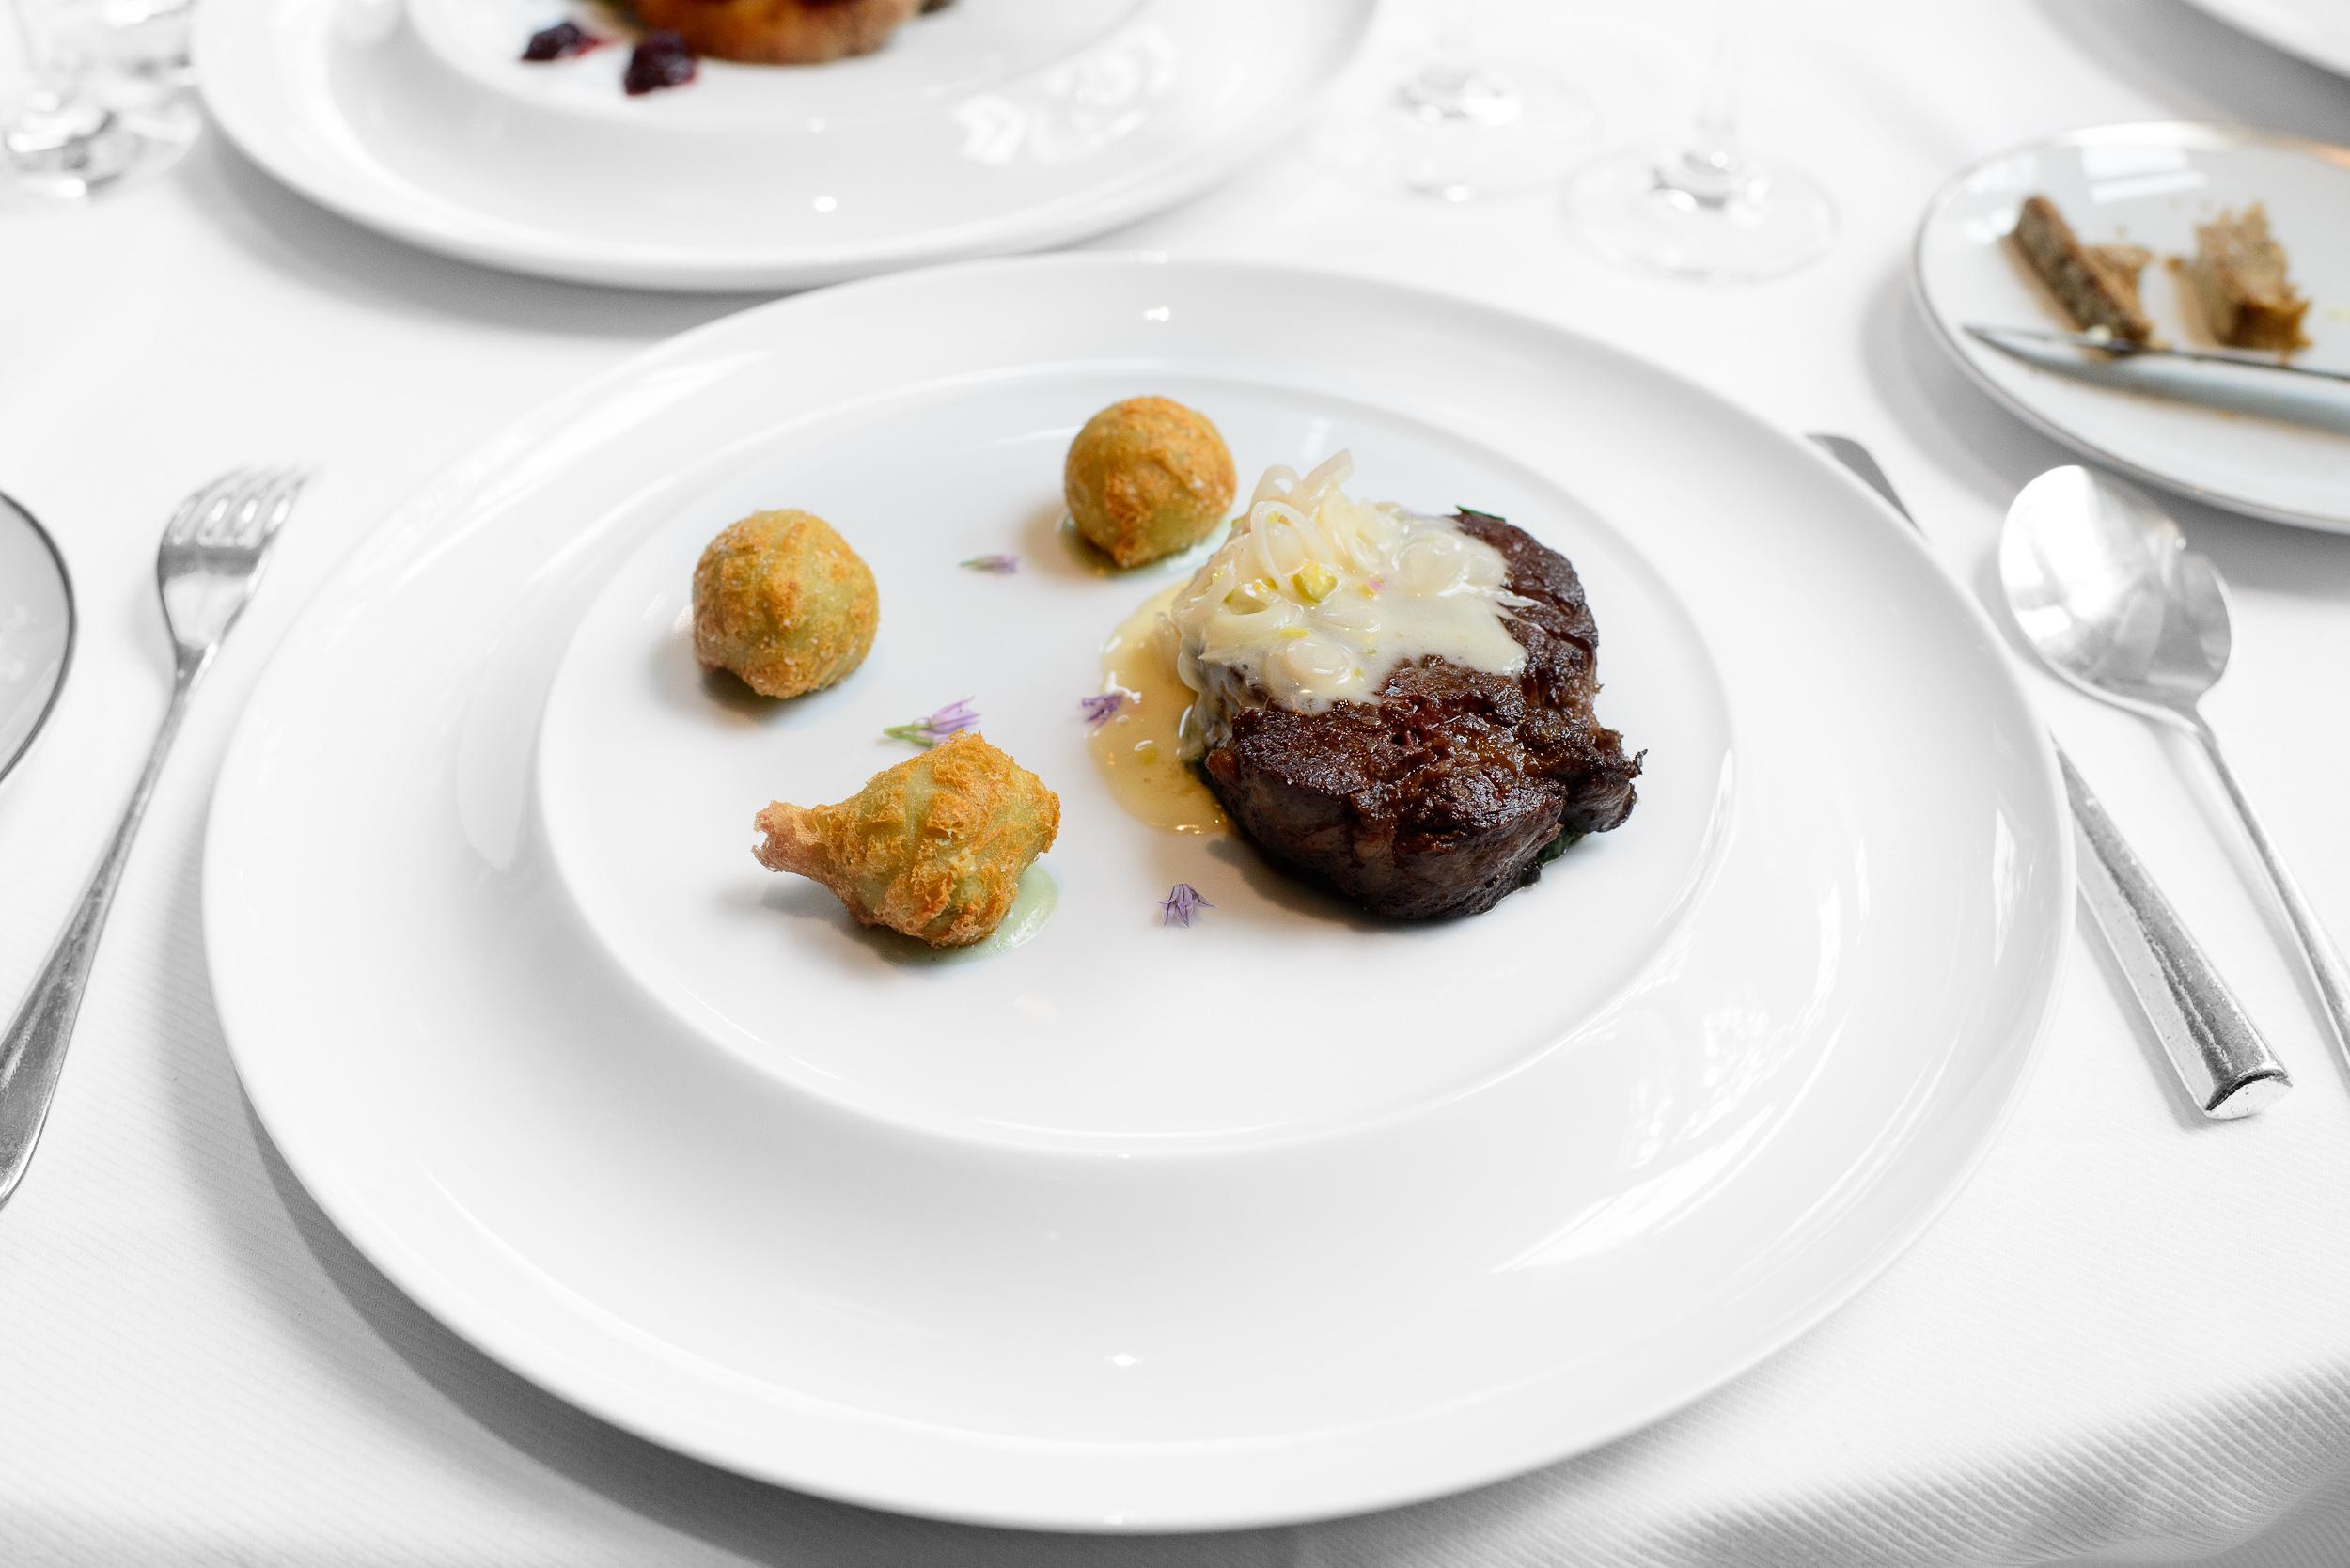 Caramelized wagyu beef, gorgonzola puffs, pickled ramp fondue